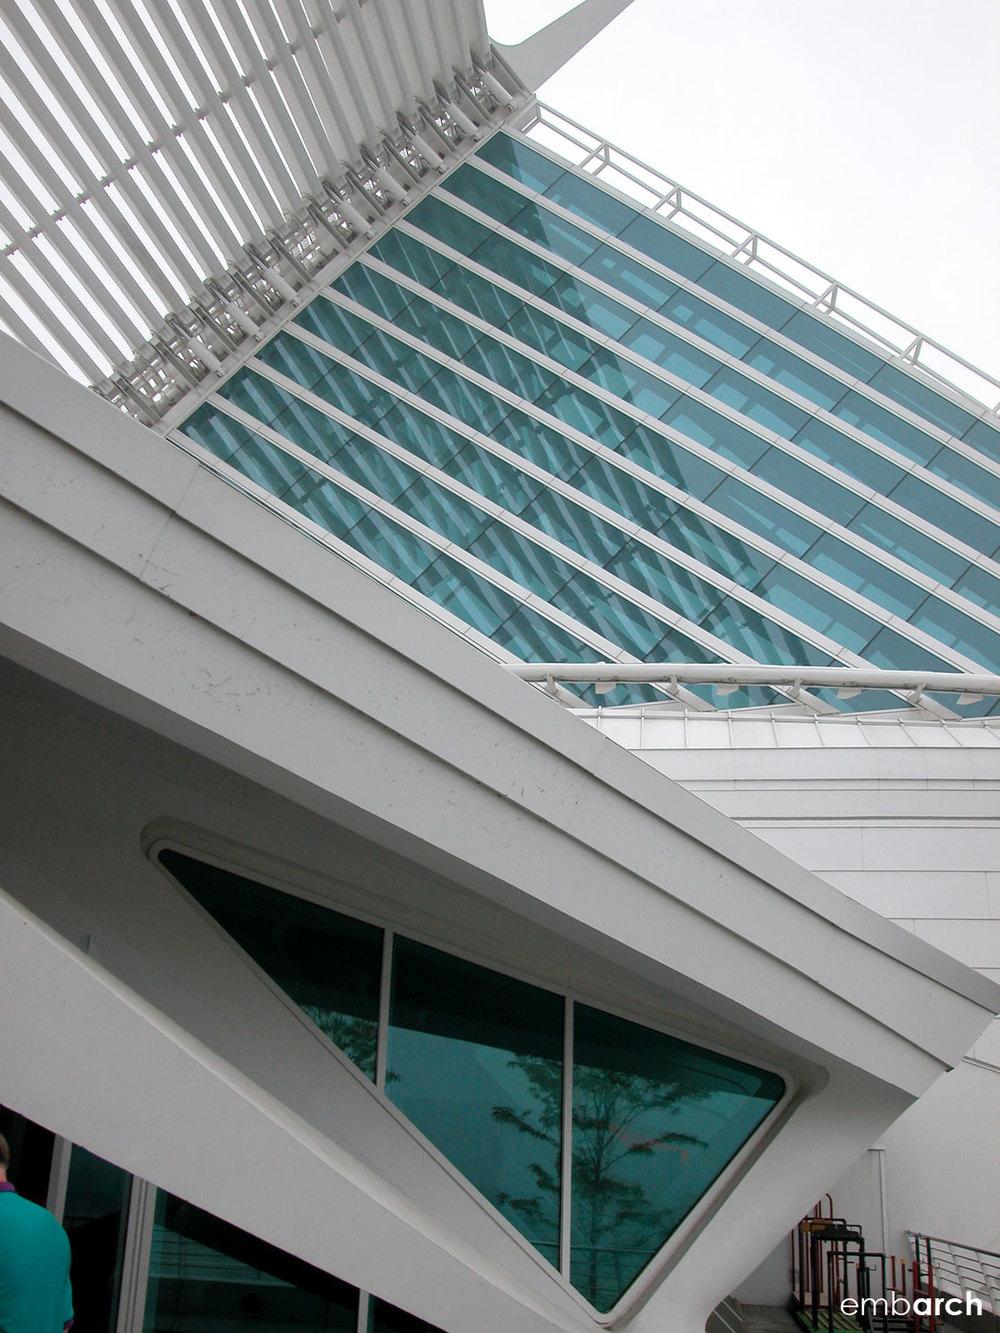 Quaddraci Pavilion at the Milwaukee Art Museum